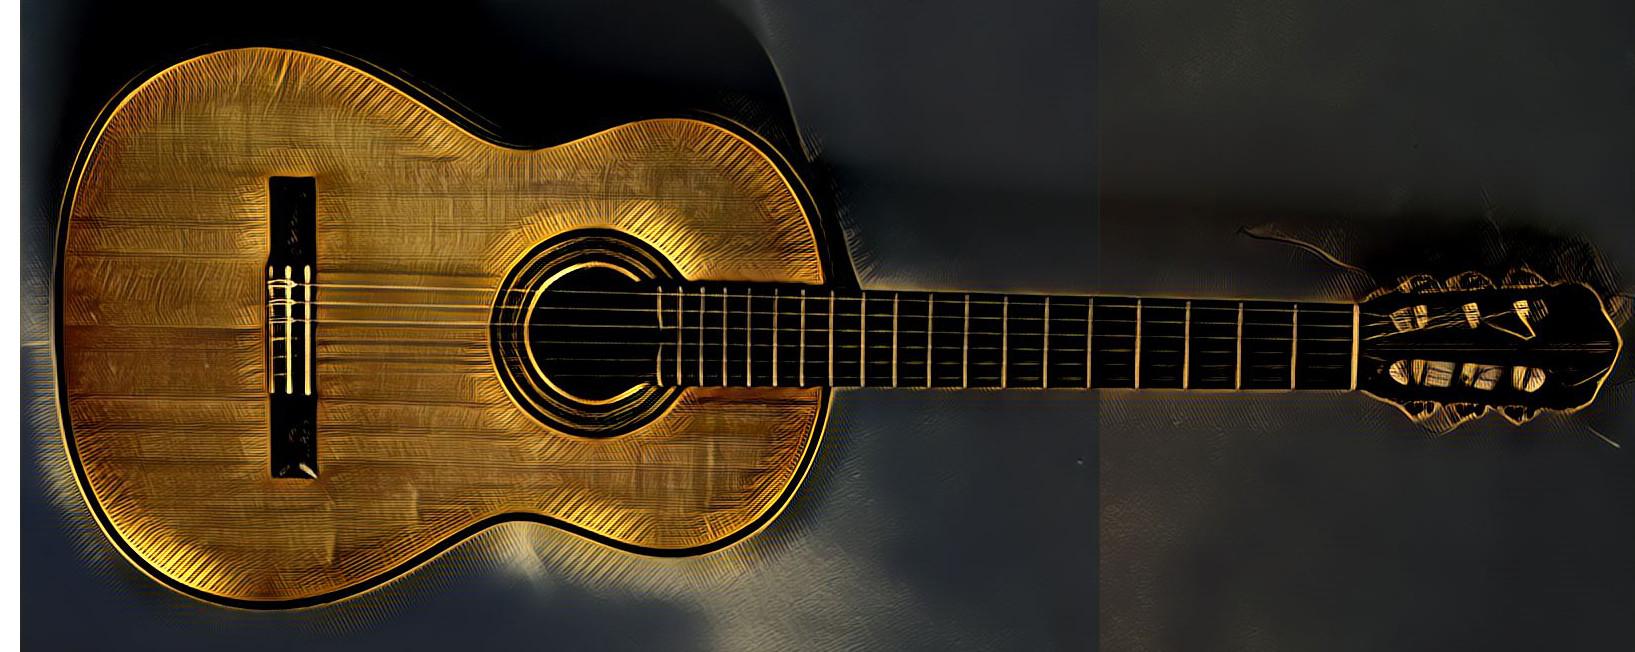 guitare painture.jpg